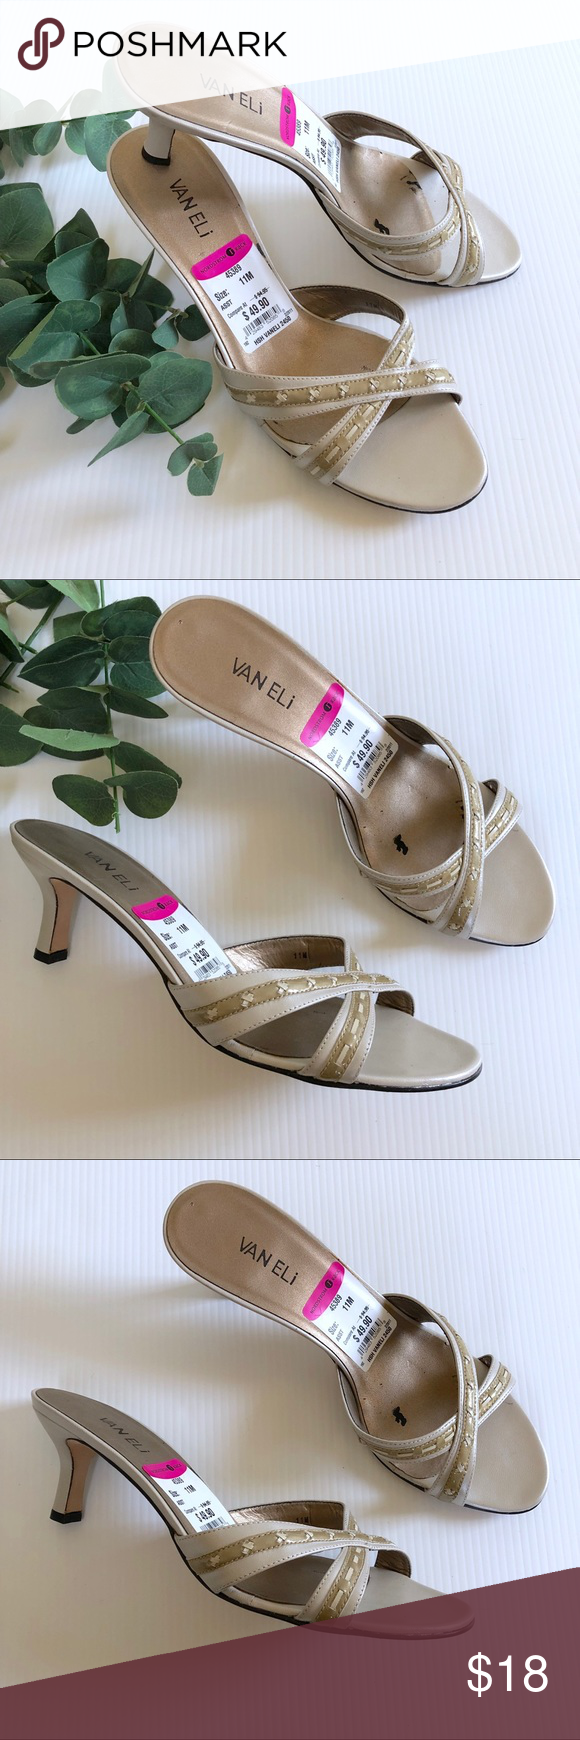 Amazon Com Shoezy Womens Dresses Metallic Rhinestones Strappy Kitten Heels Sandals Shoes Kitten Heel Sandals Wedding Shoes Heels Shoes Heels Prom